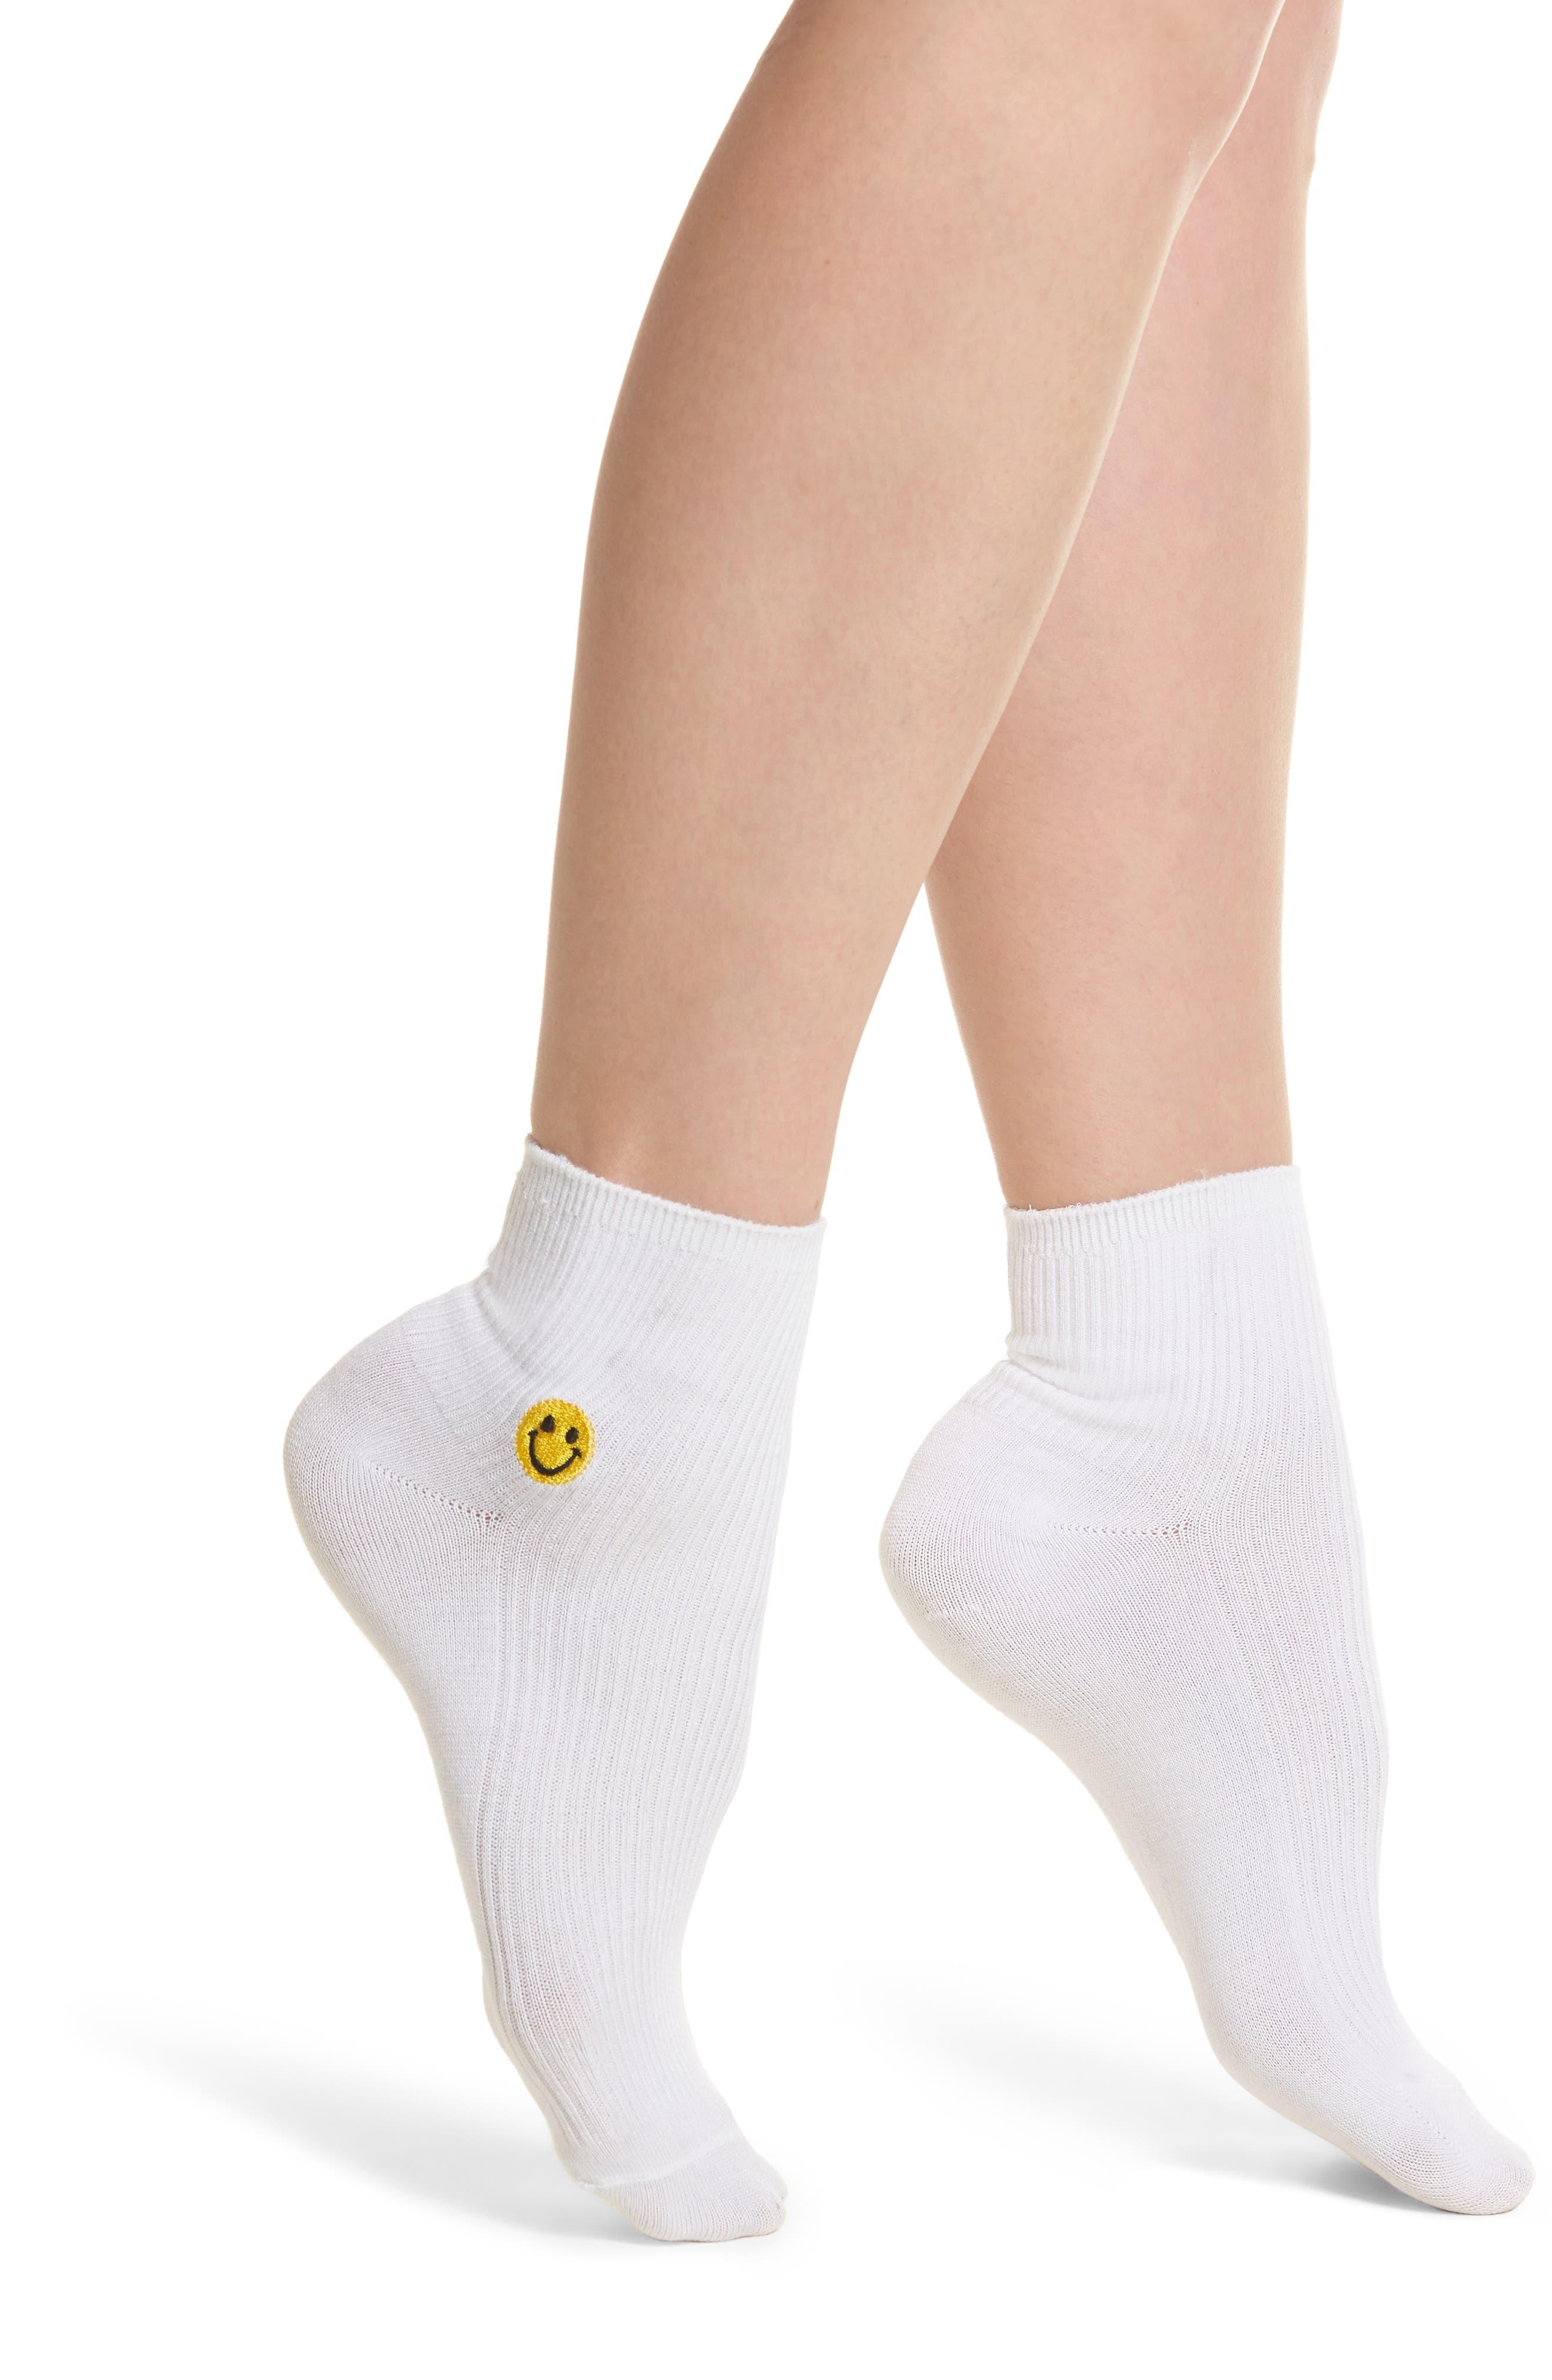 Smiles Ankle Socks,                             Main thumbnail 1, color,                             White